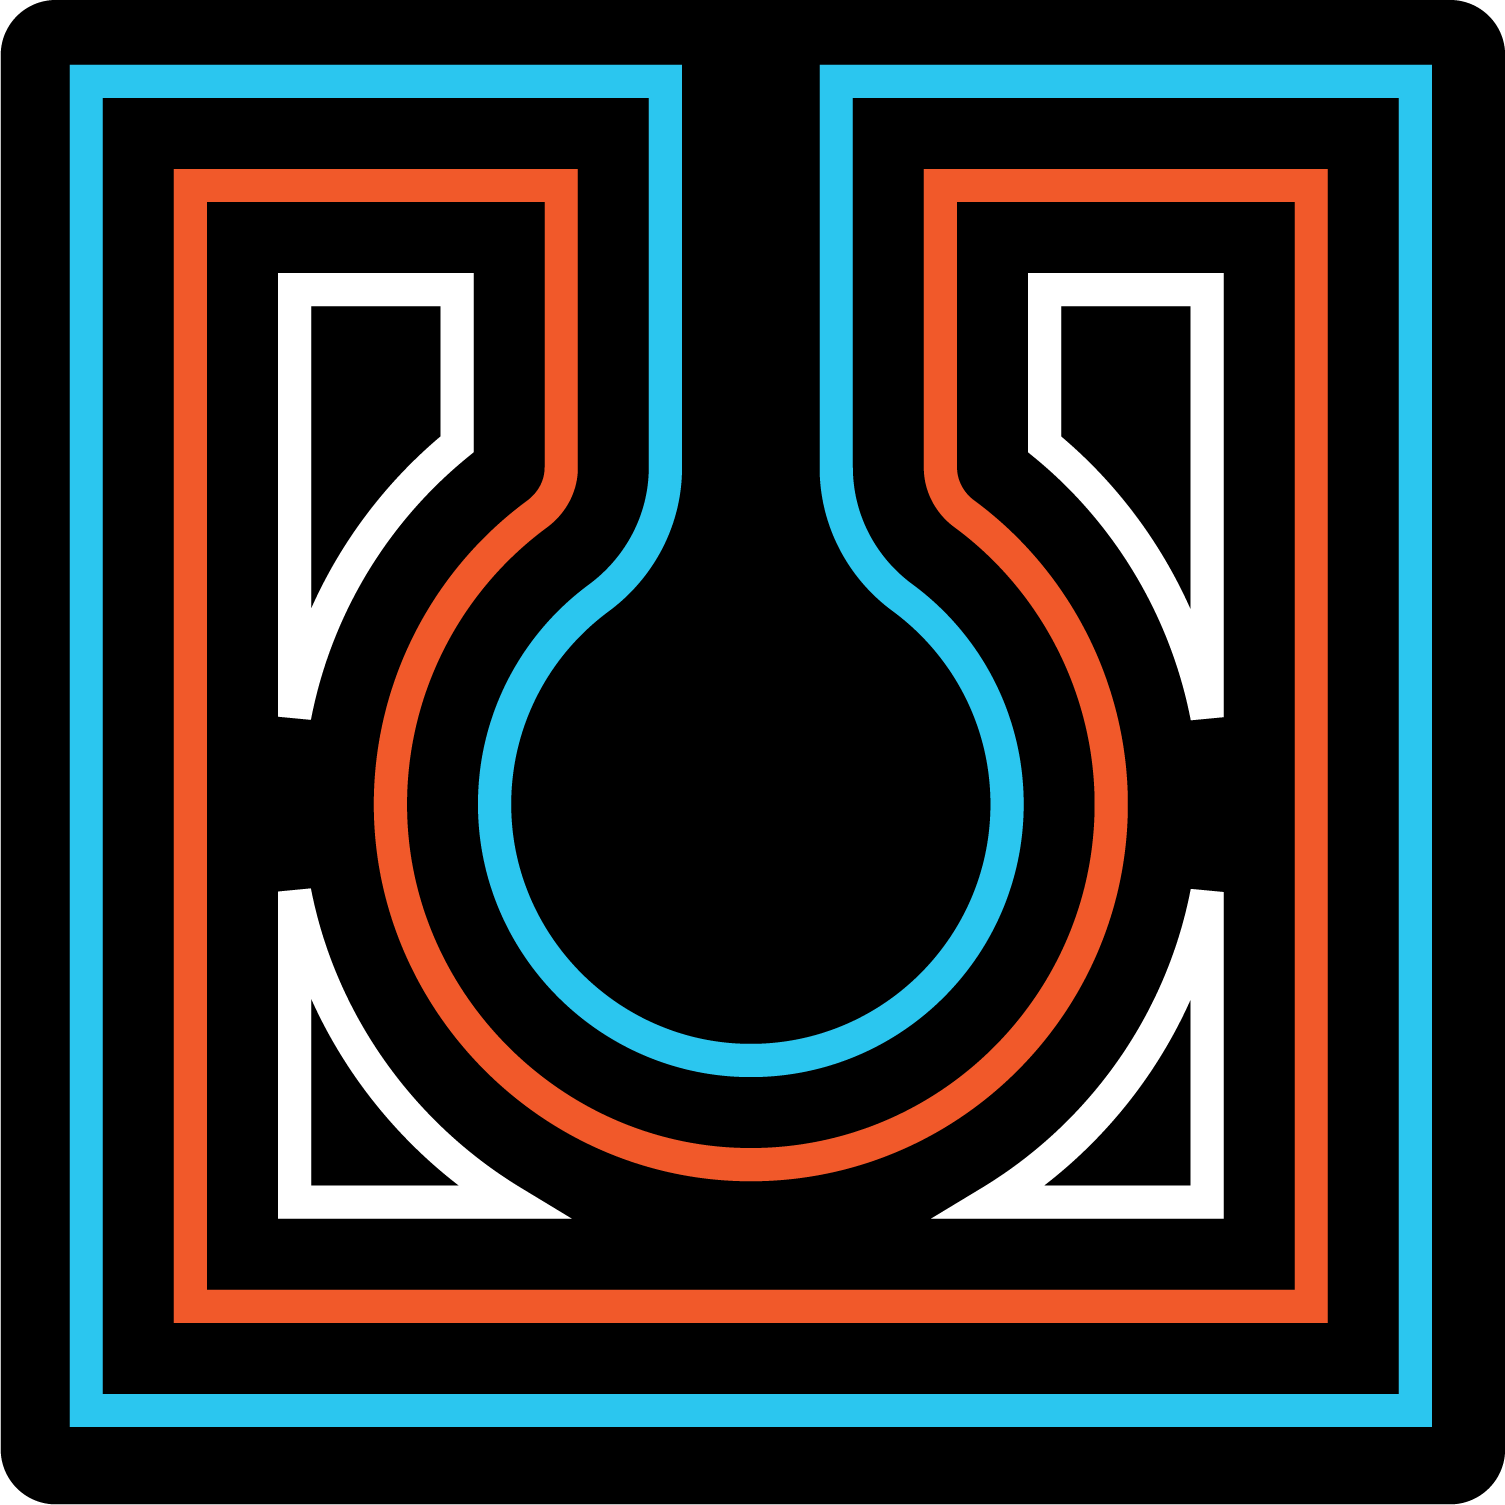 tinderbox-games-lab-logo-icon-1-2